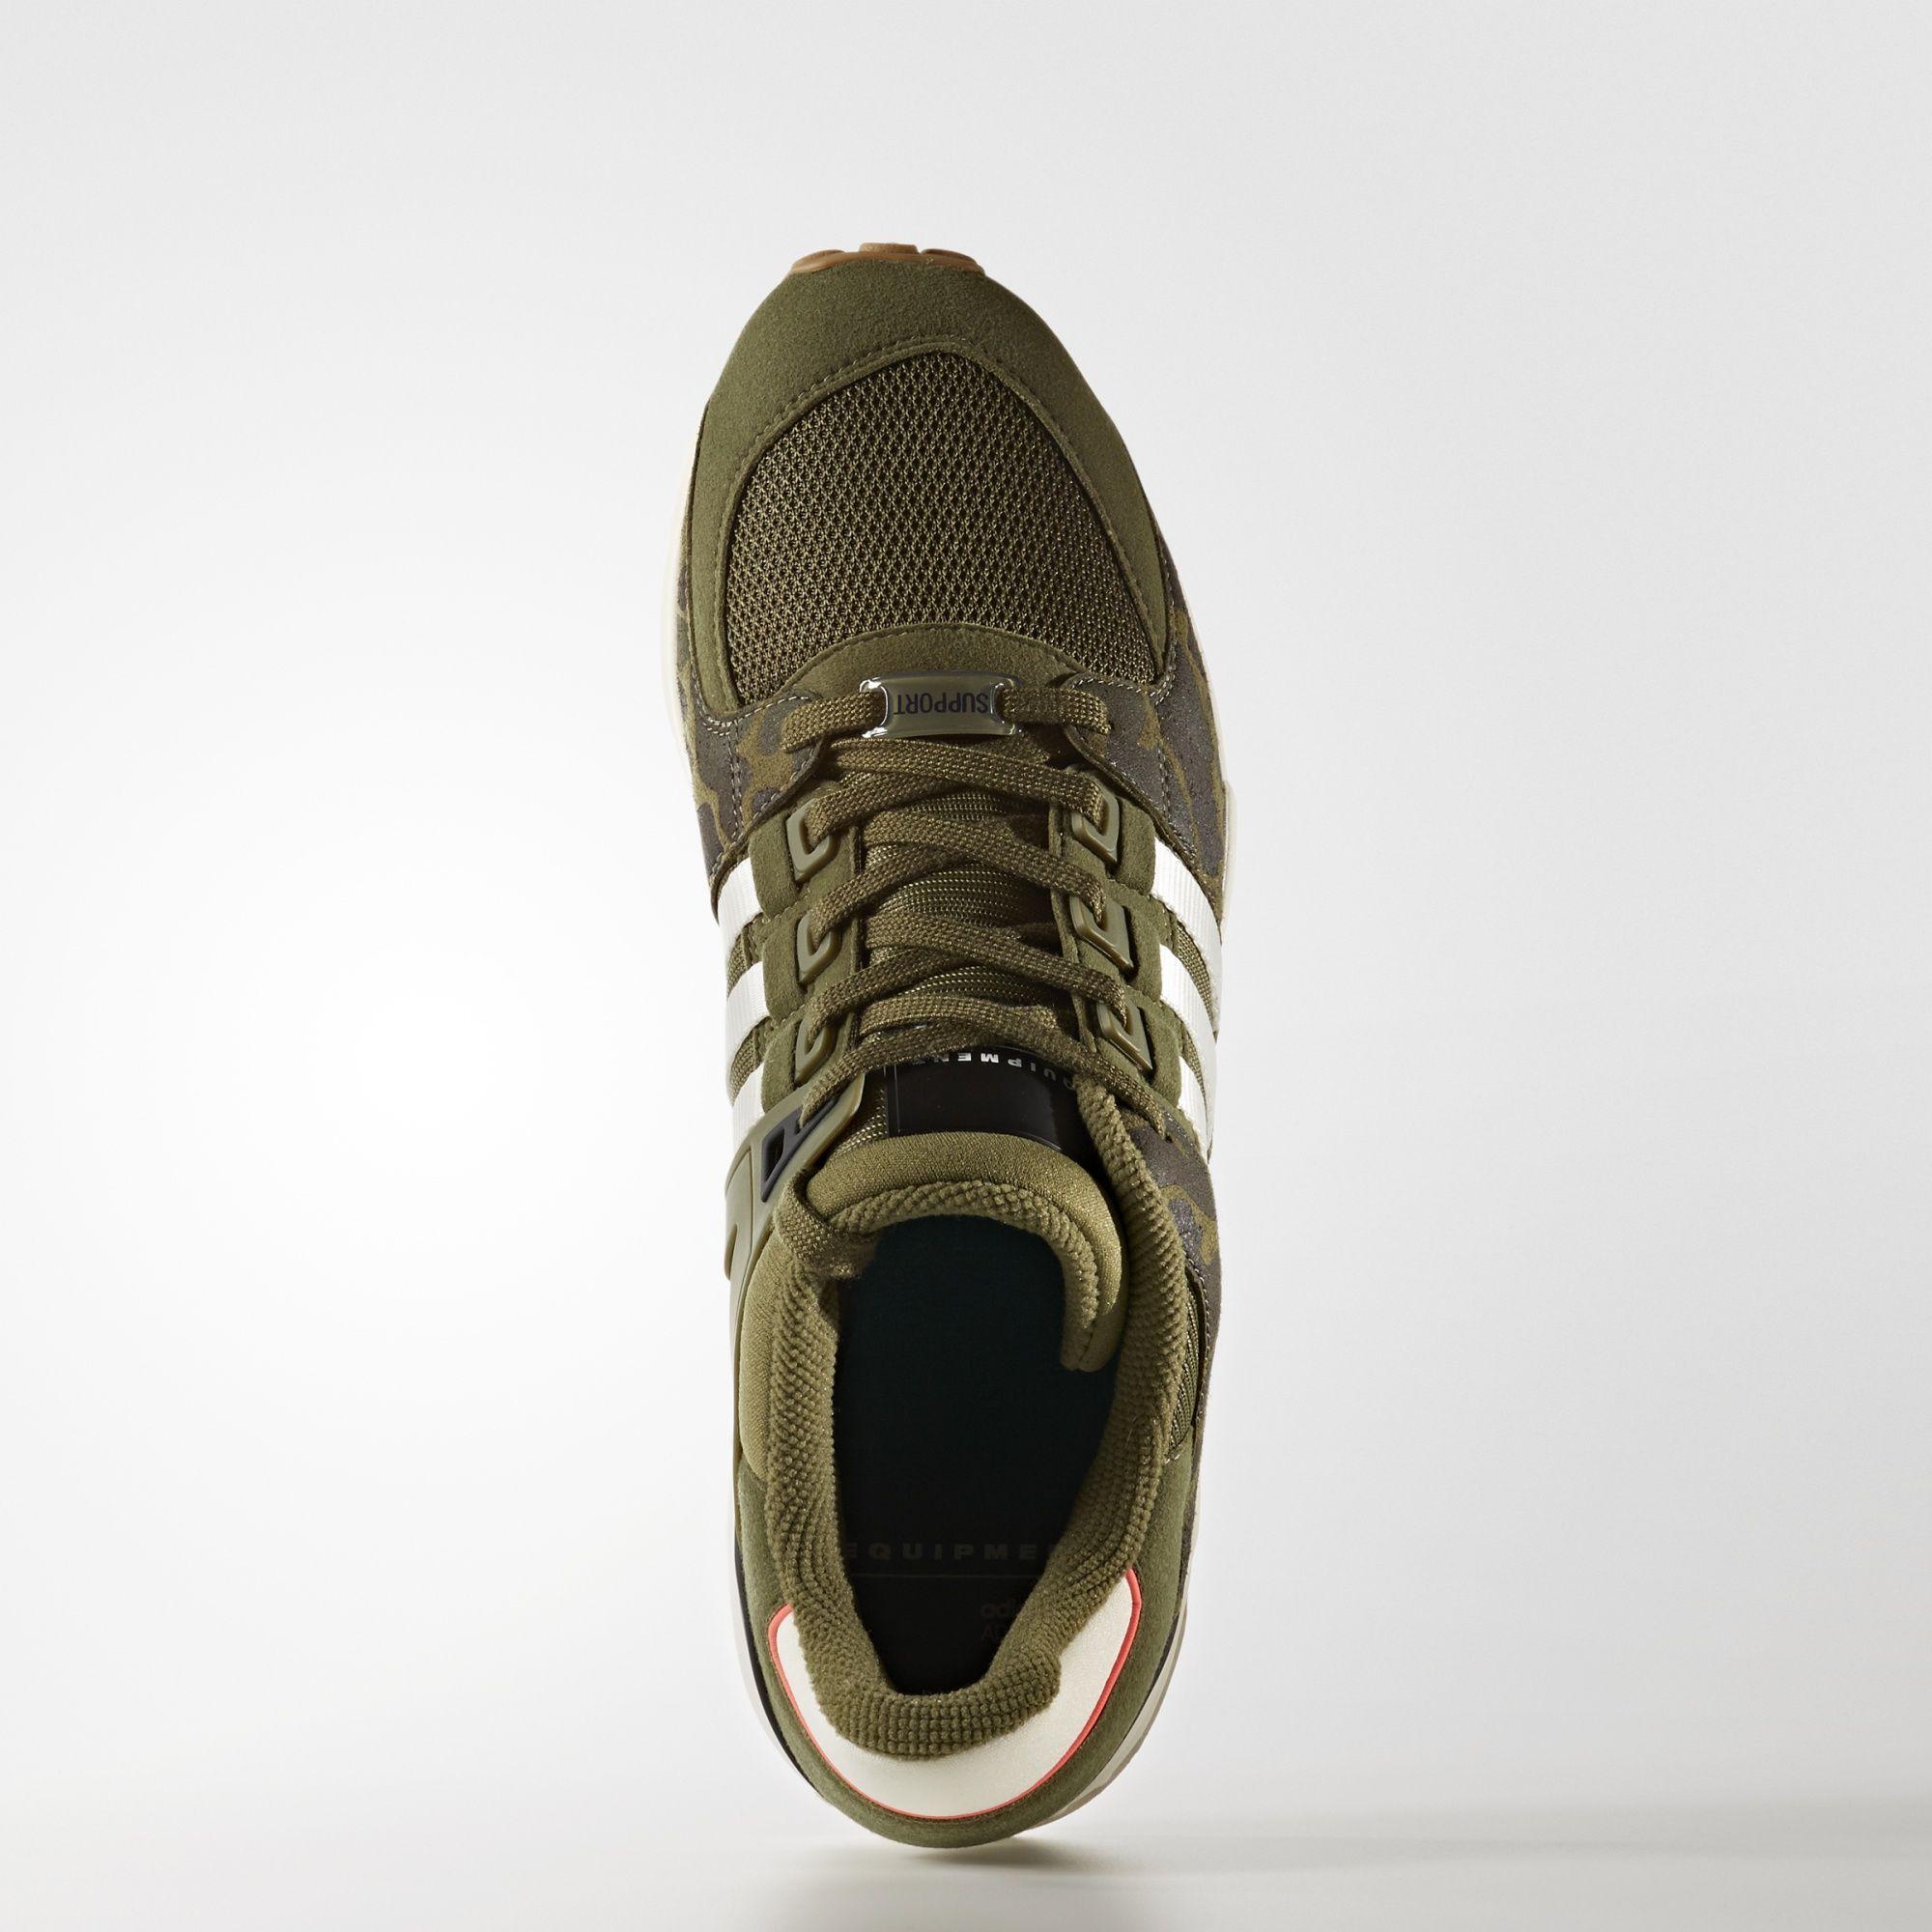 adidas EQT Support RF Olive Camo BB1323 1